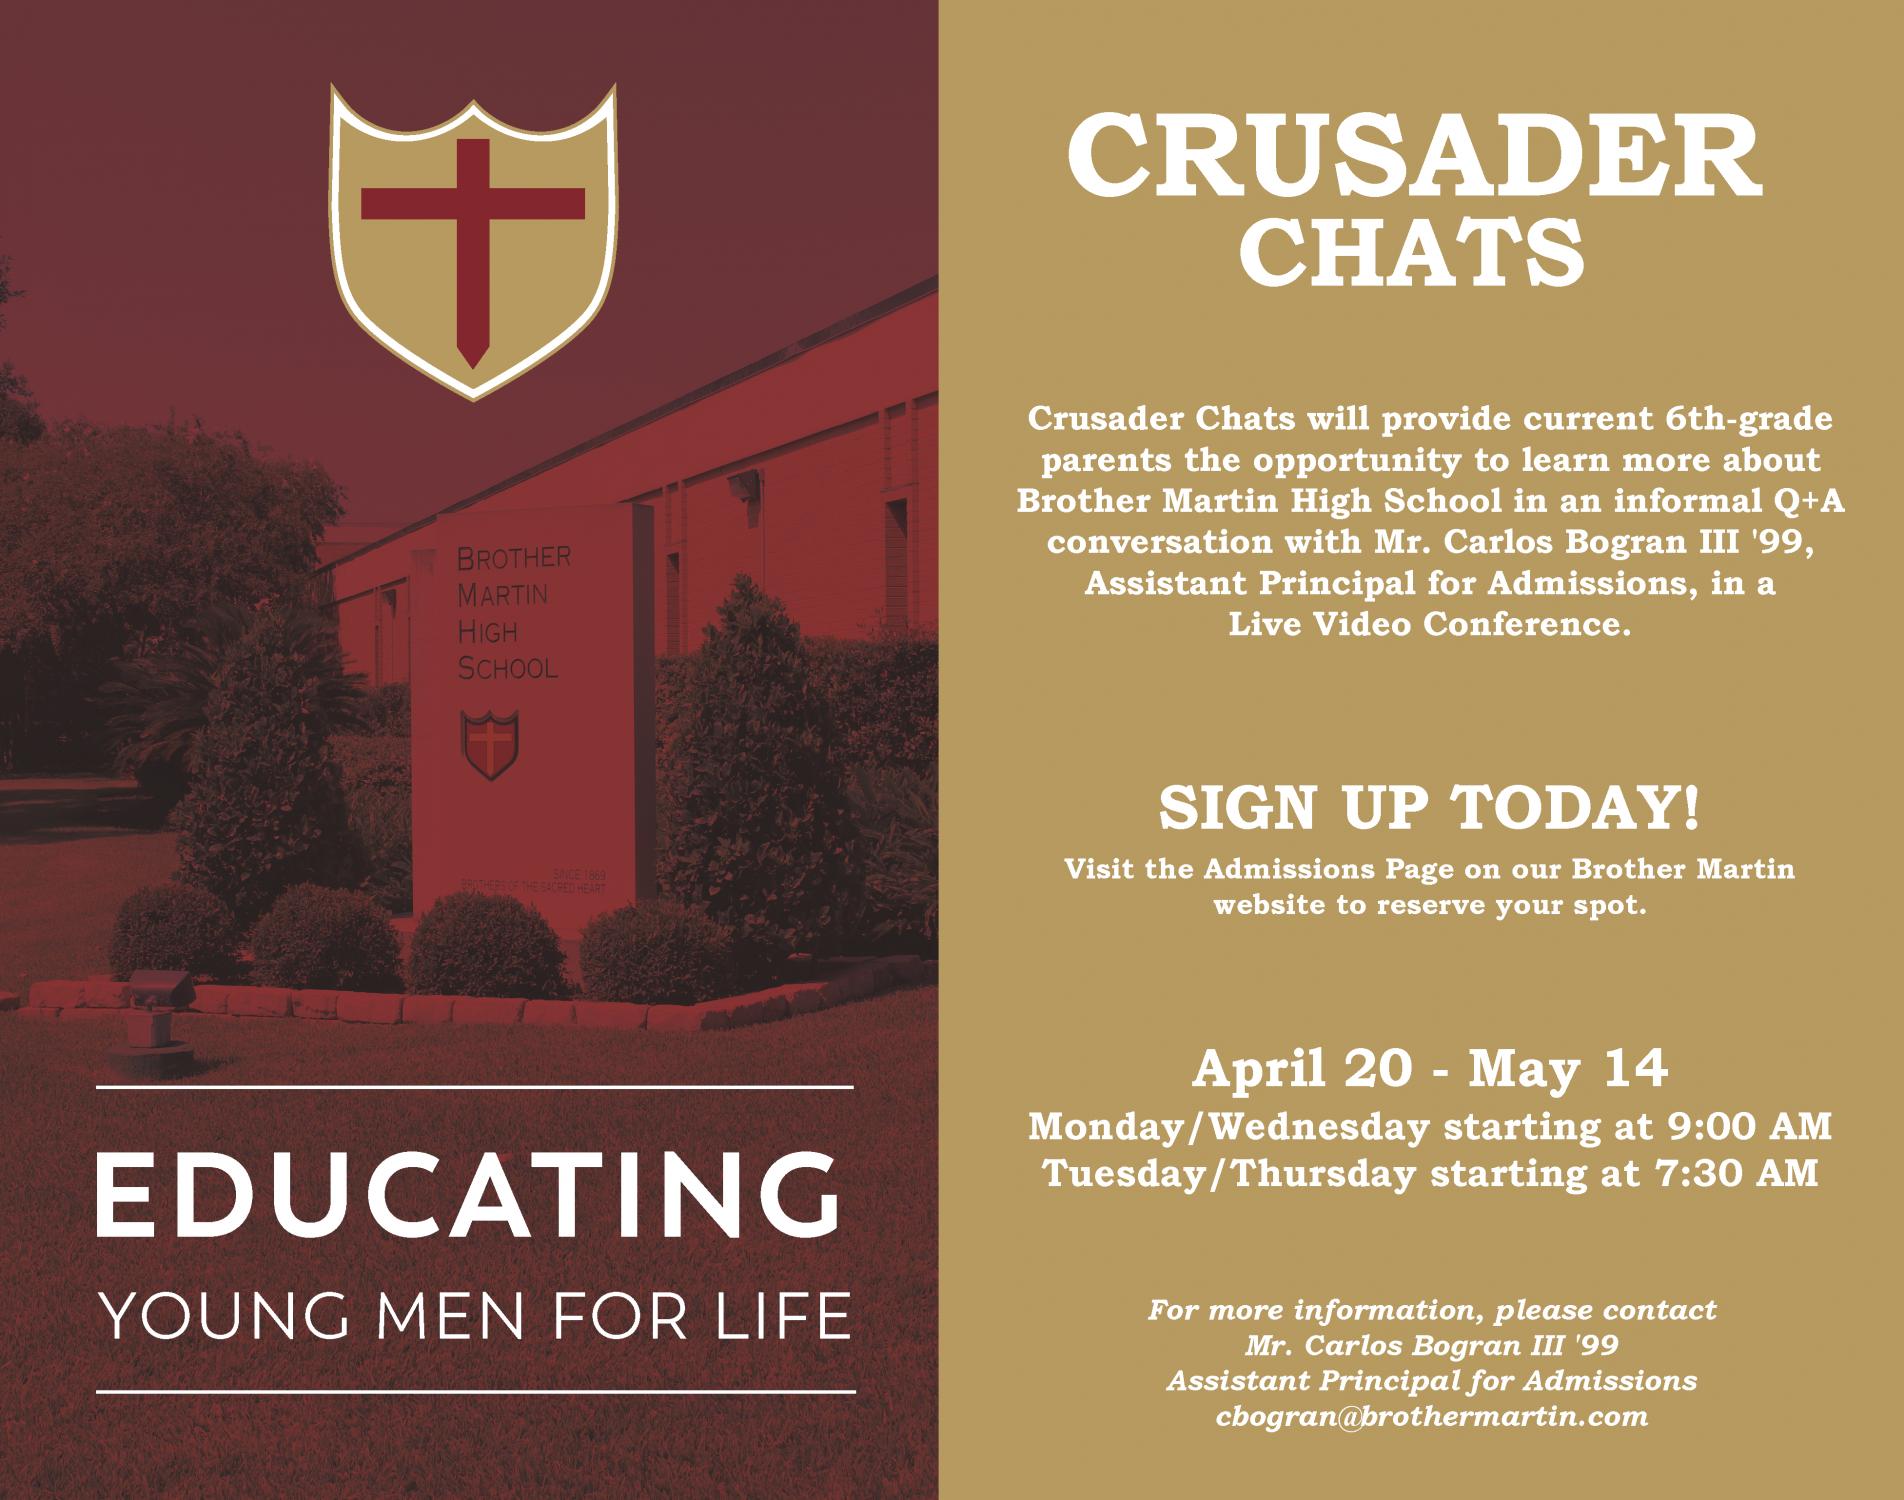 Crusader Chats - Updated